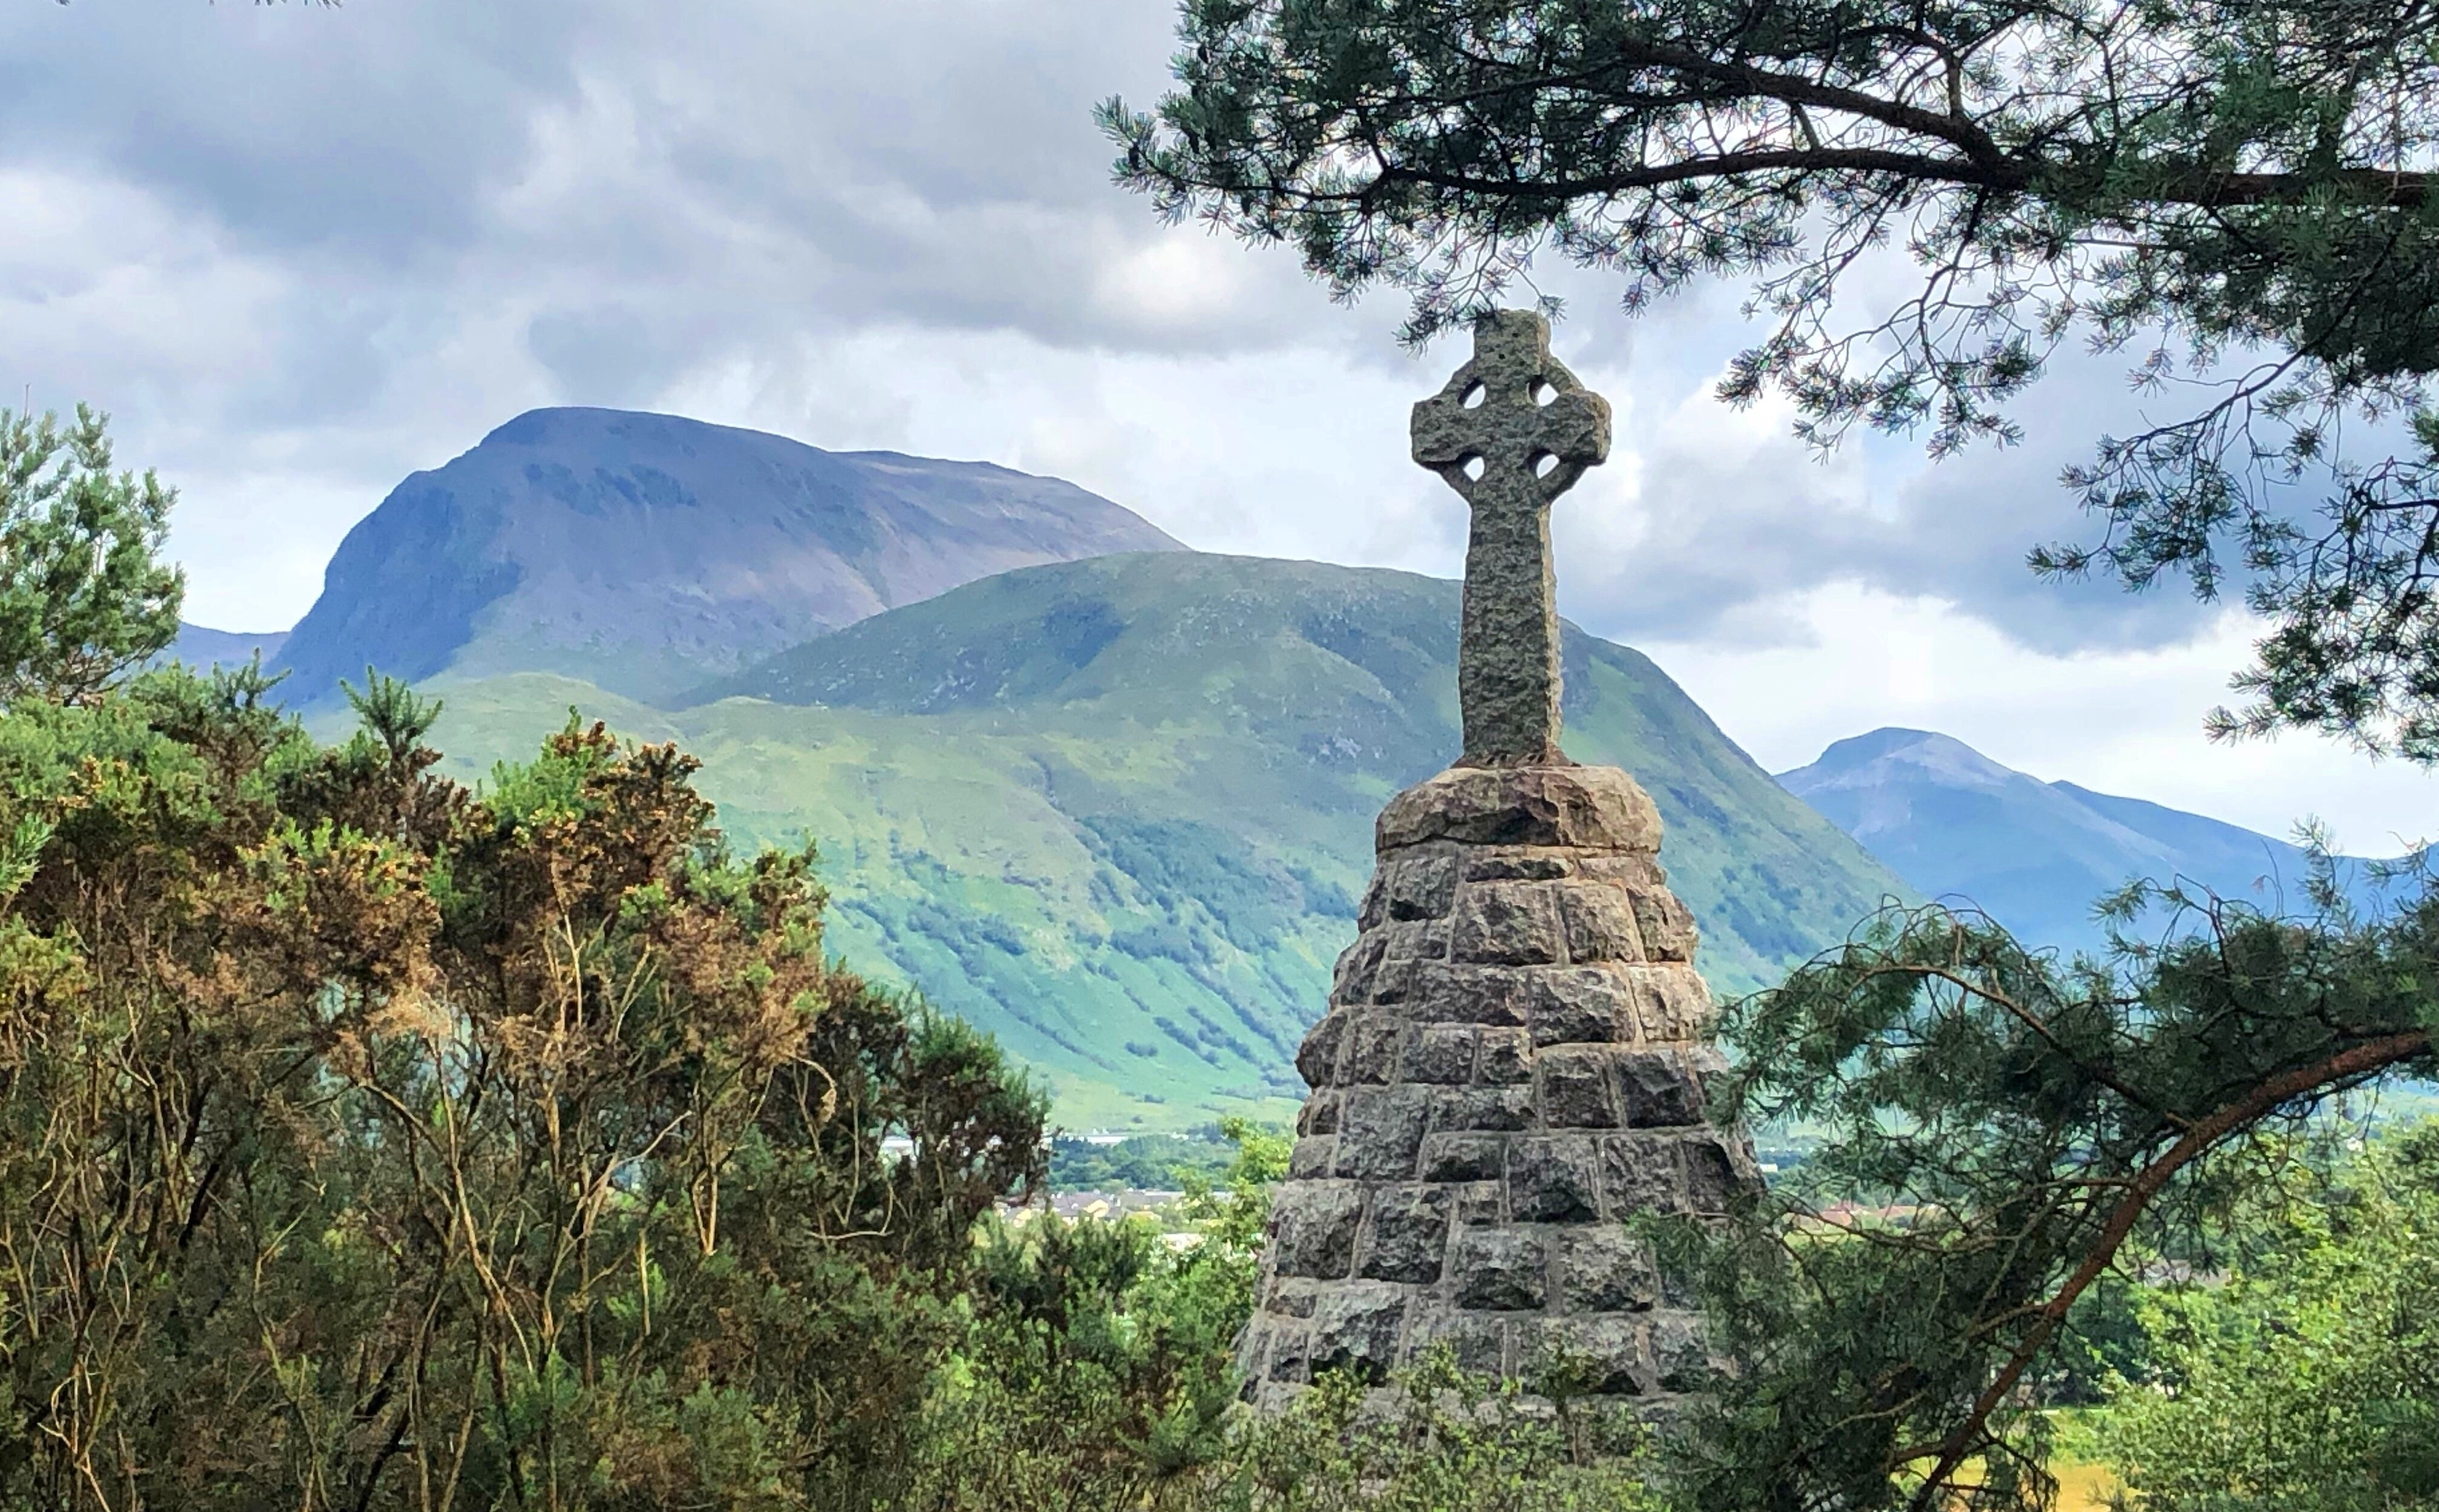 First World War memorial cross above Banavie looking across to Ben Nevis.